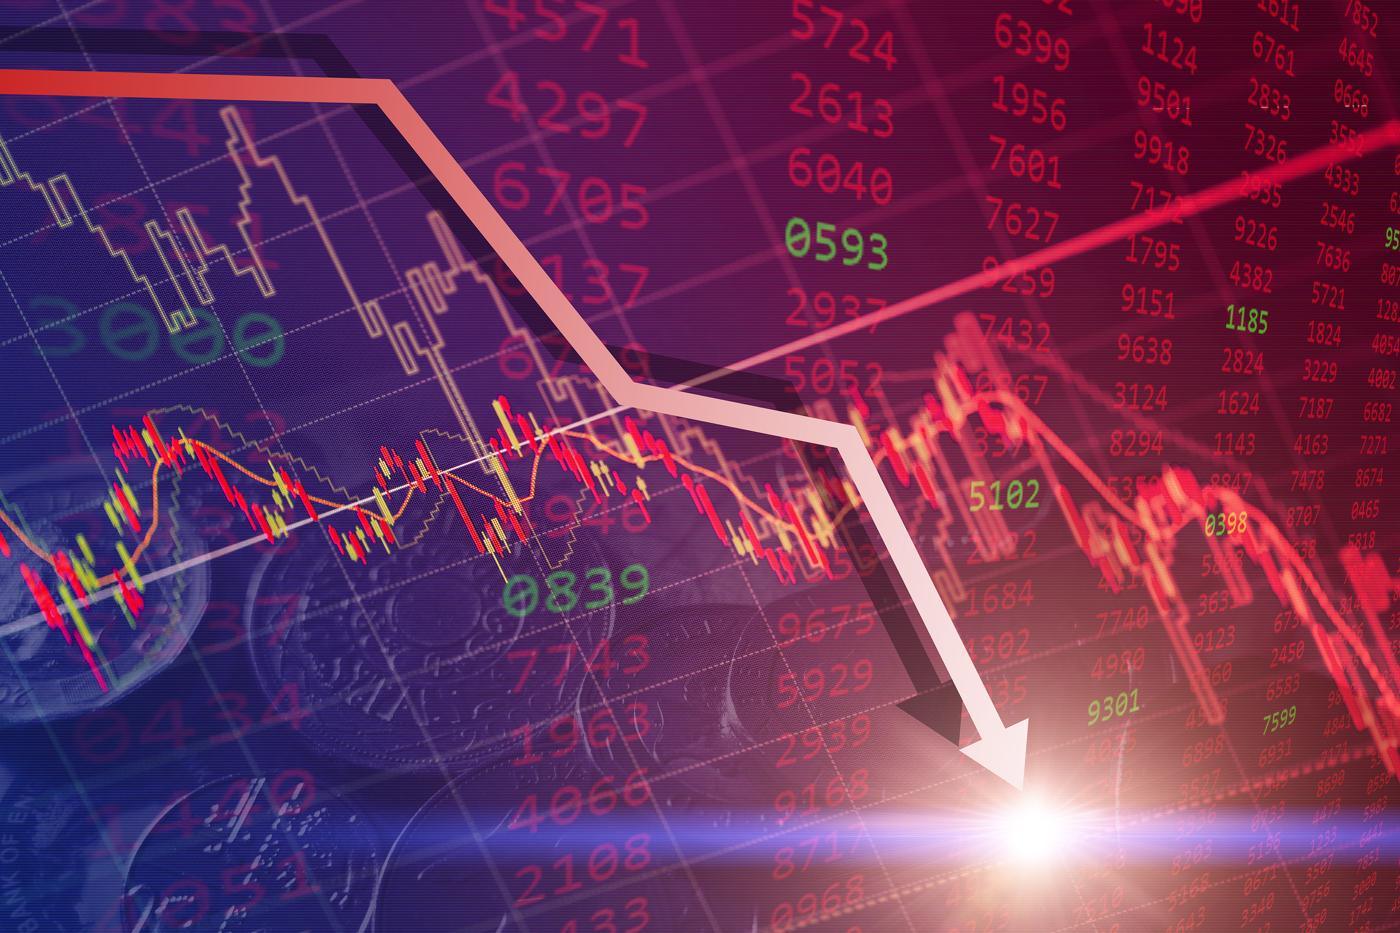 Stock downtrend, stock price drop, bearish run